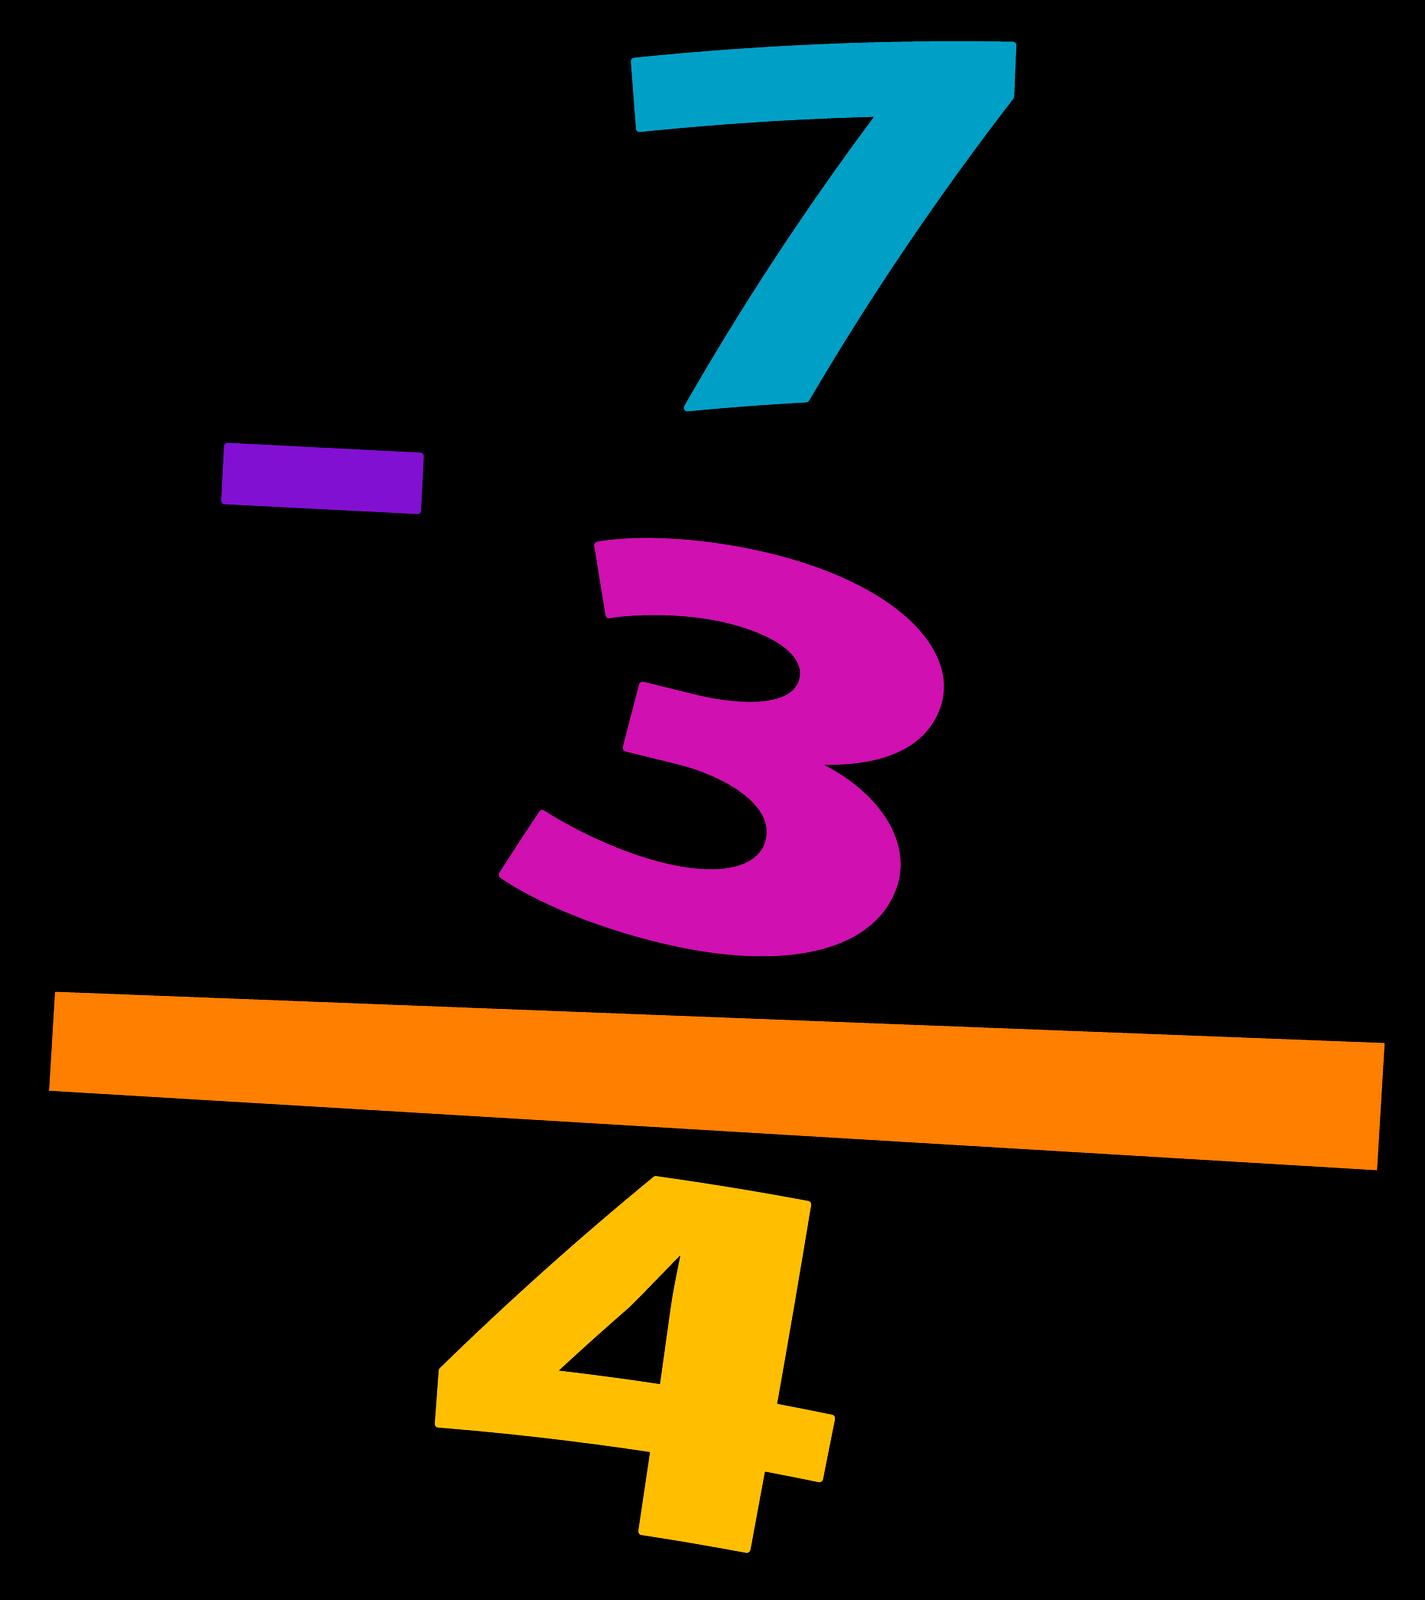 Mathematics Clipart - student_solving_mathematics_problem ...  |Art Math Problems